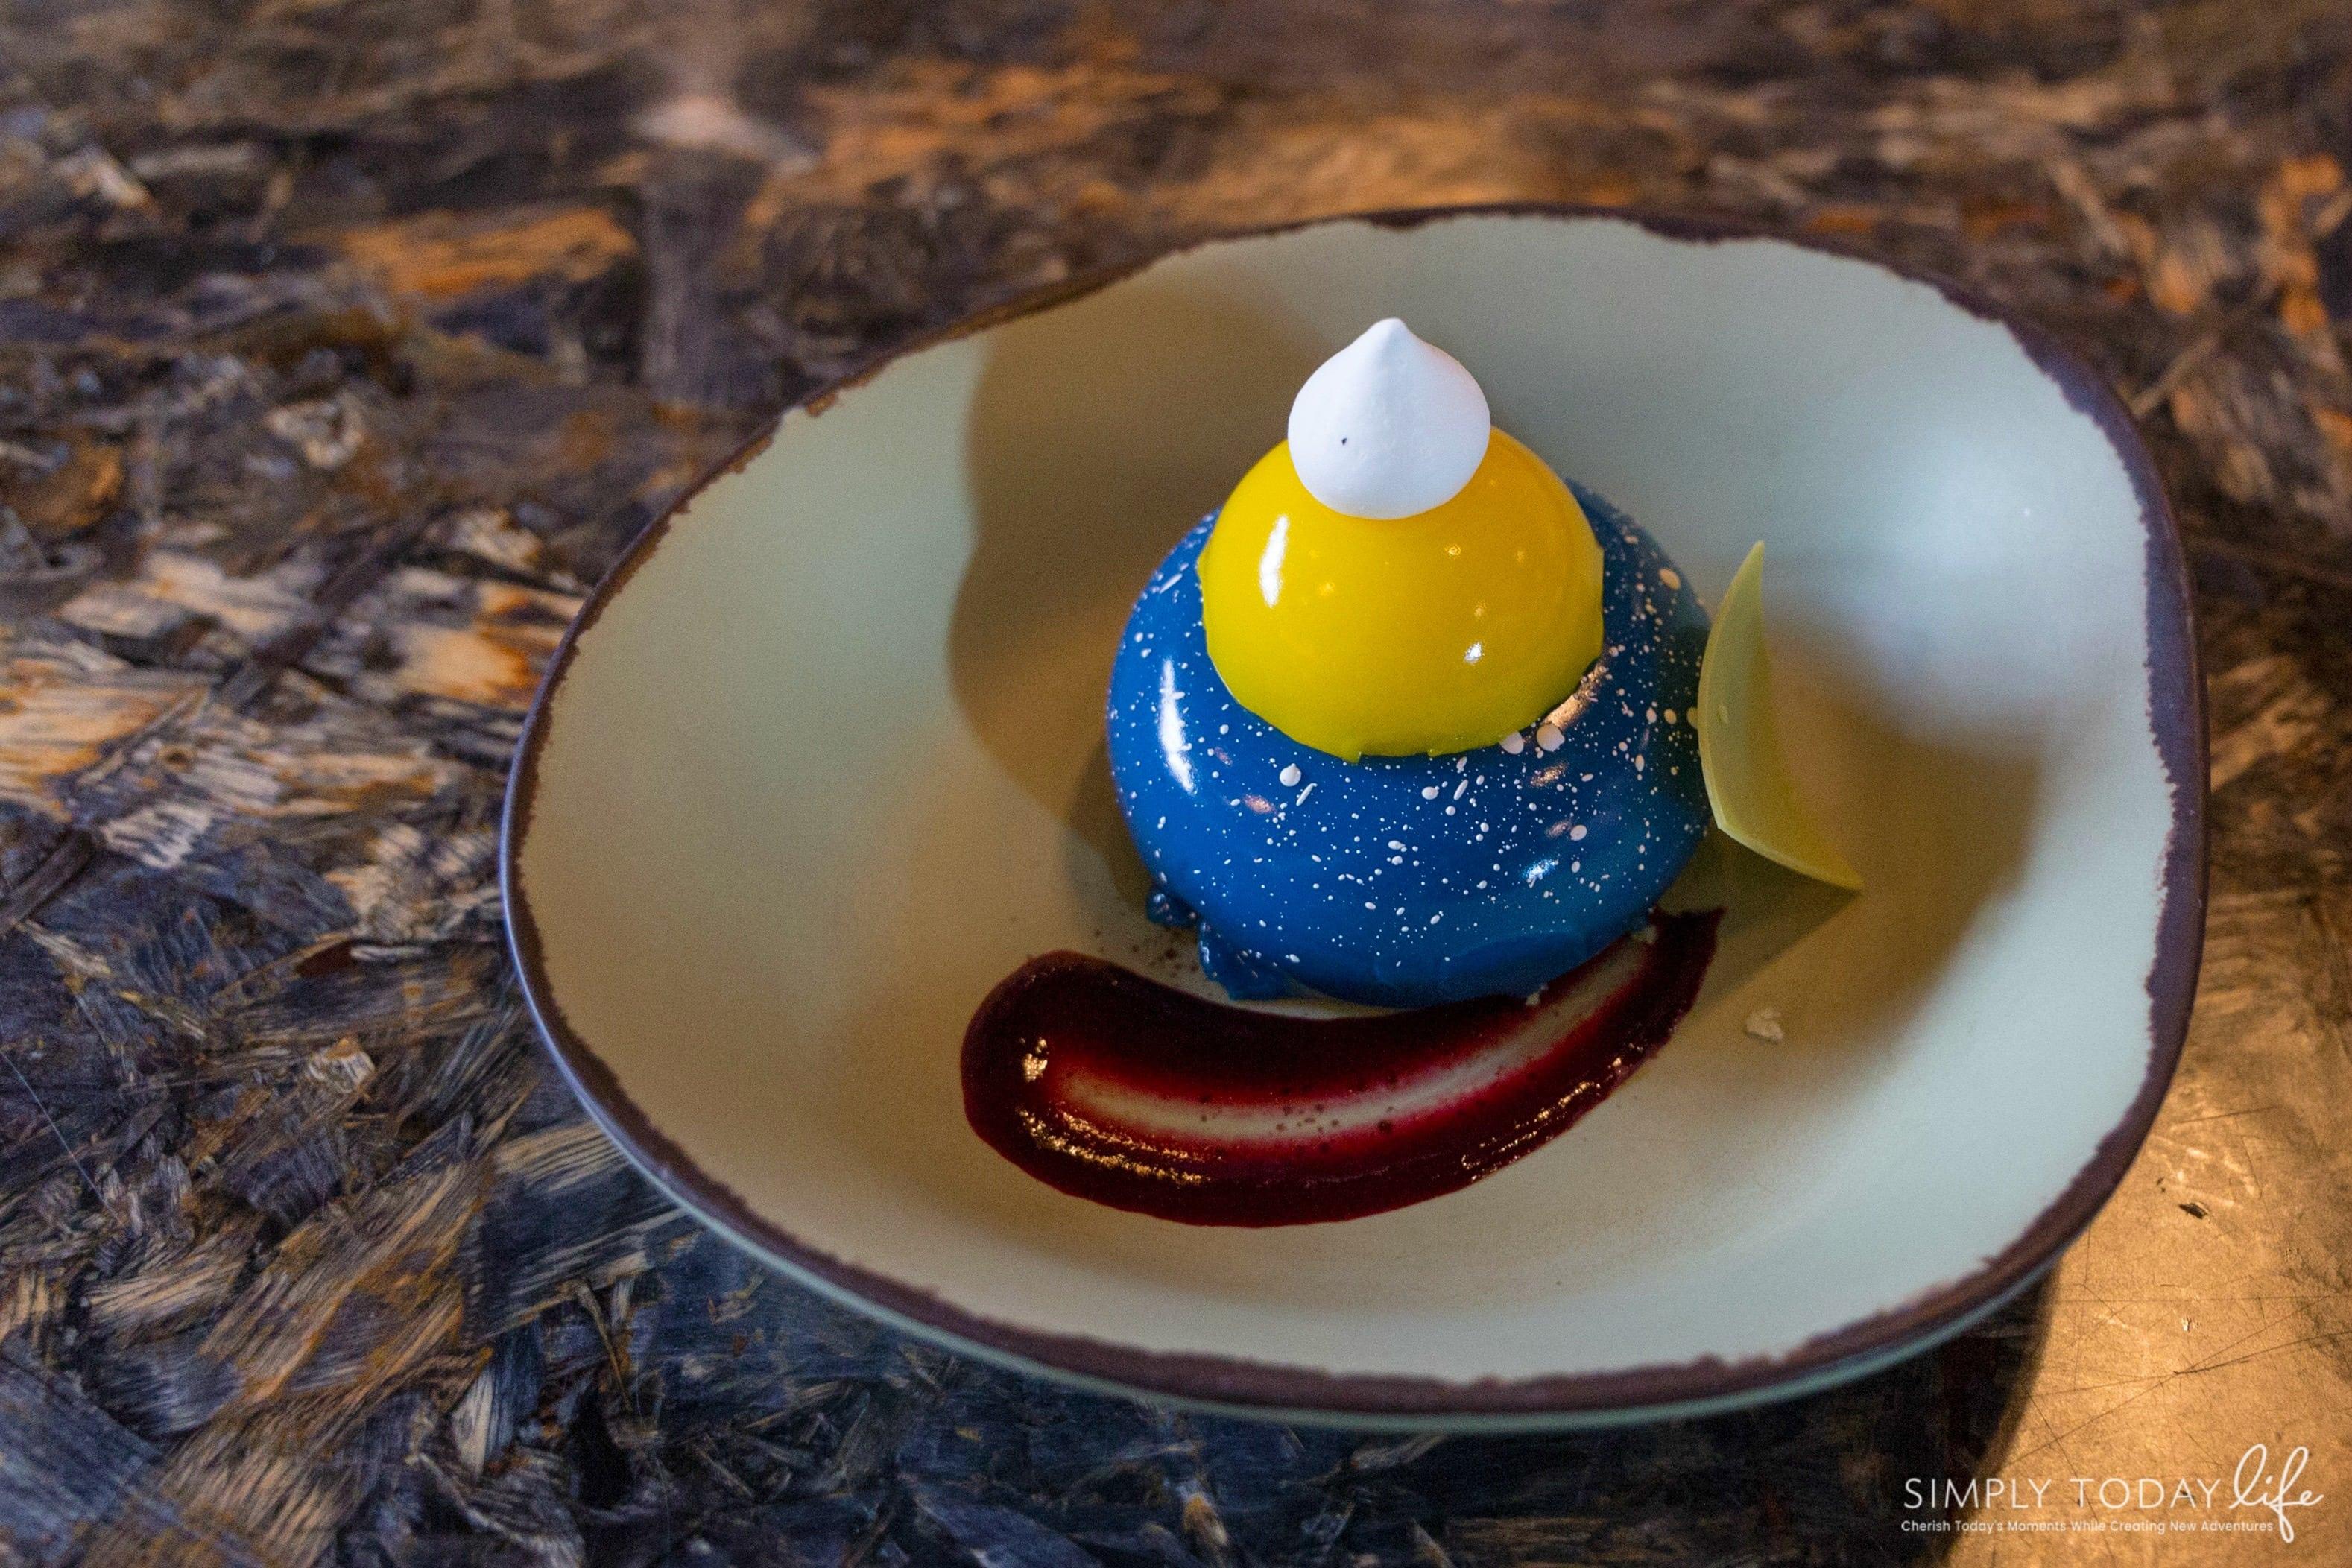 Satu'li Canteen Blueberry Cream Cheese Mousse Dessert - simplytodalife.com